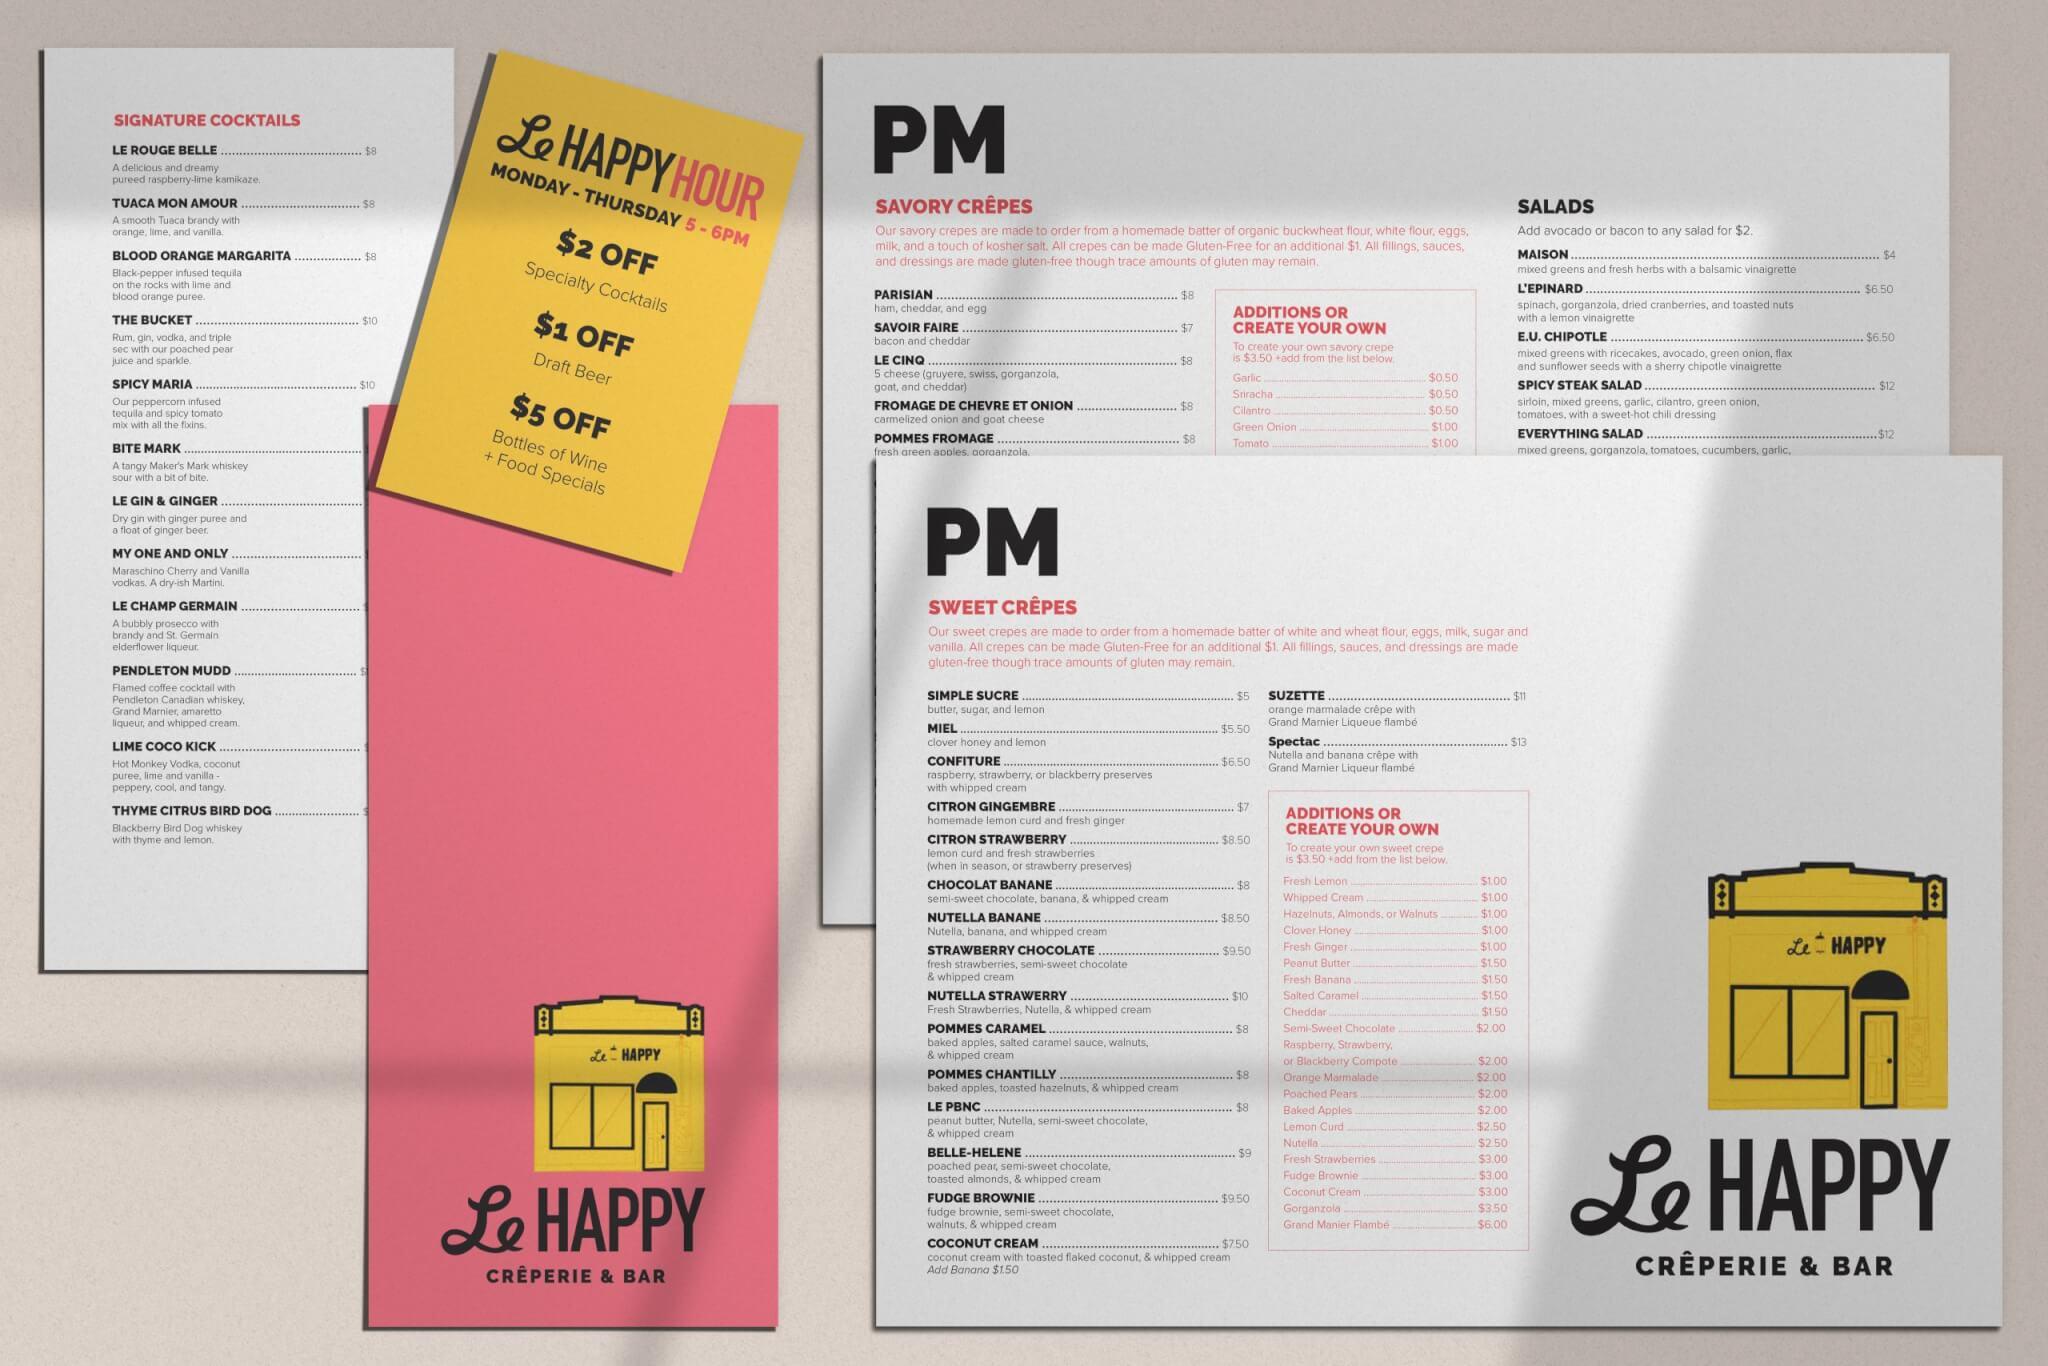 NightTime-menus-cocktails_happyhr_pm